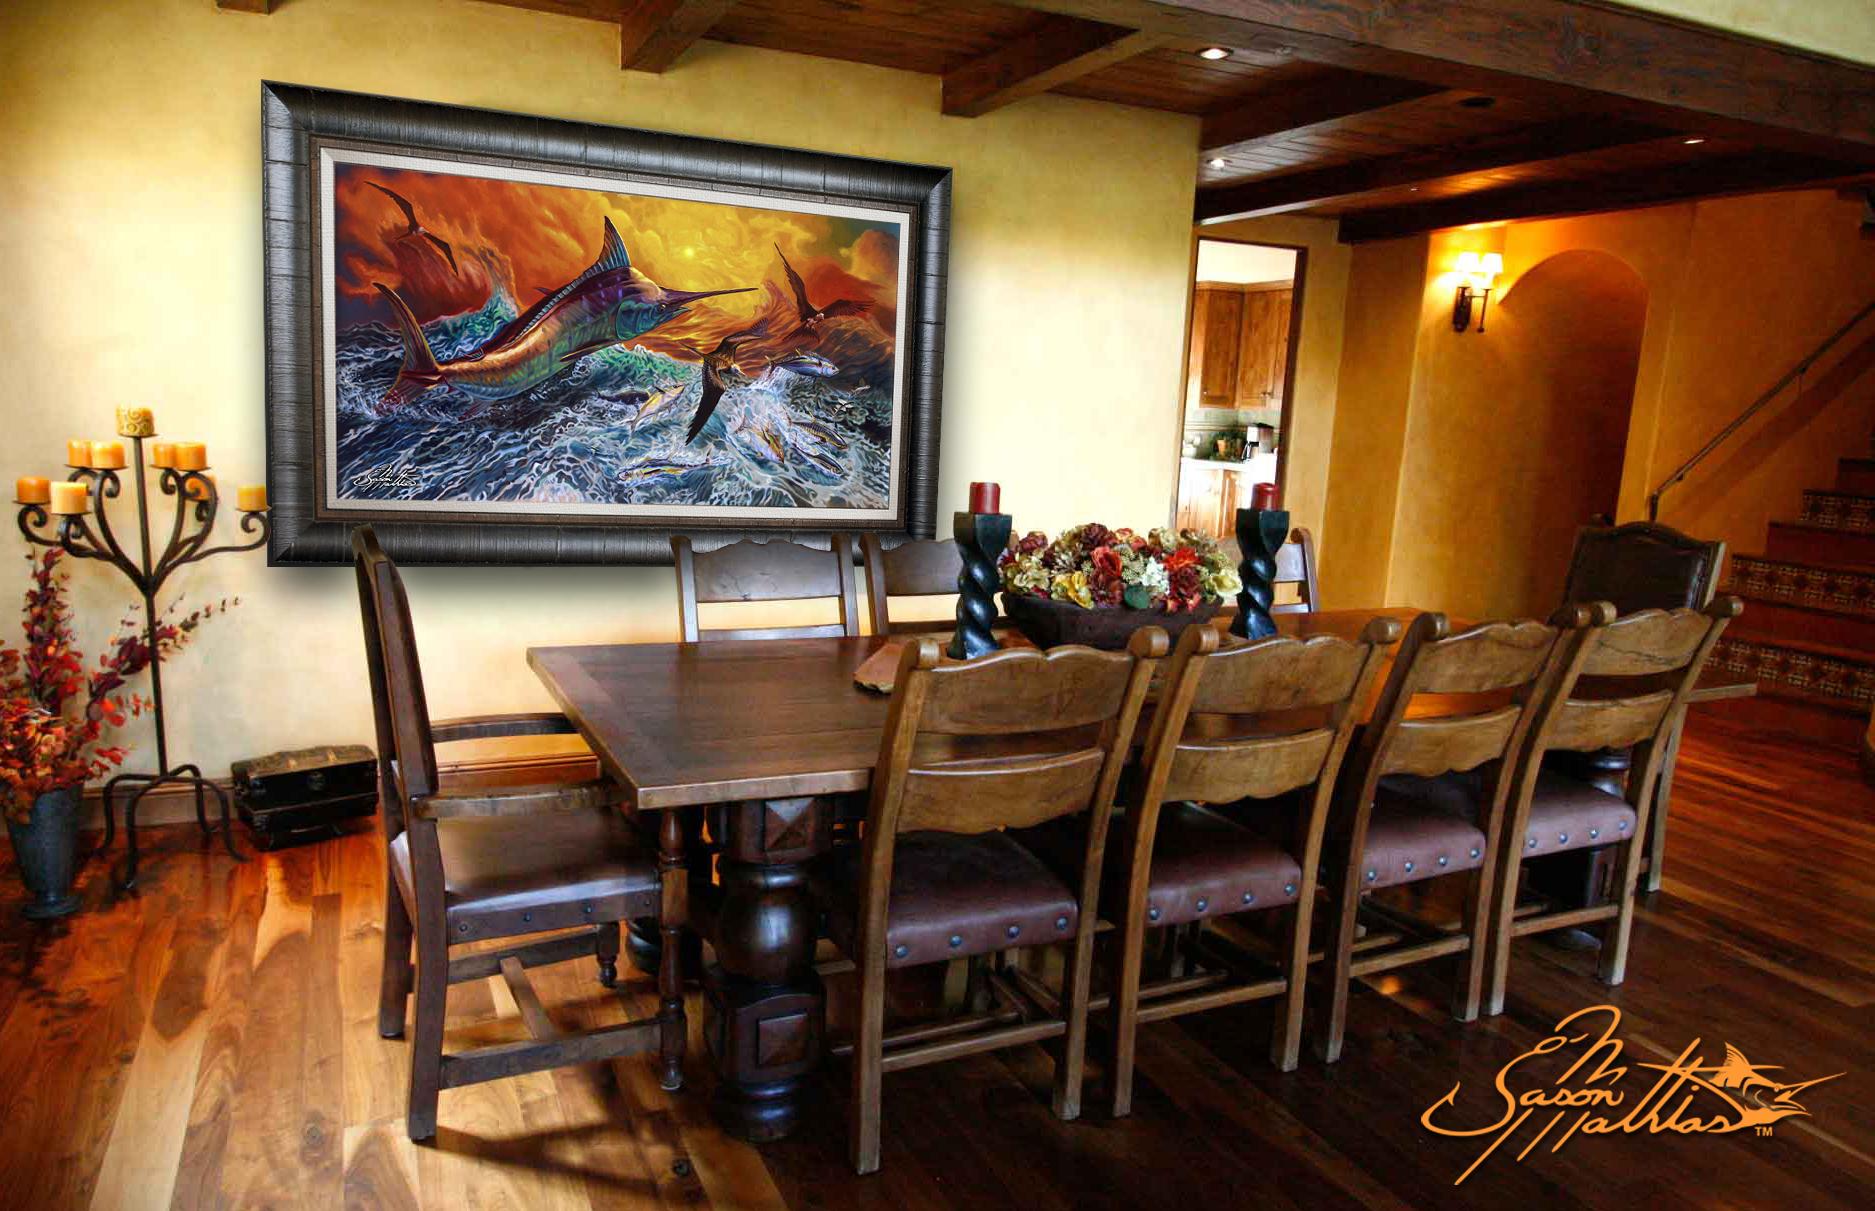 jason-mathias-interior-design-blue-marlin-art-painting-print-ideas-fishing-nautical.jpg